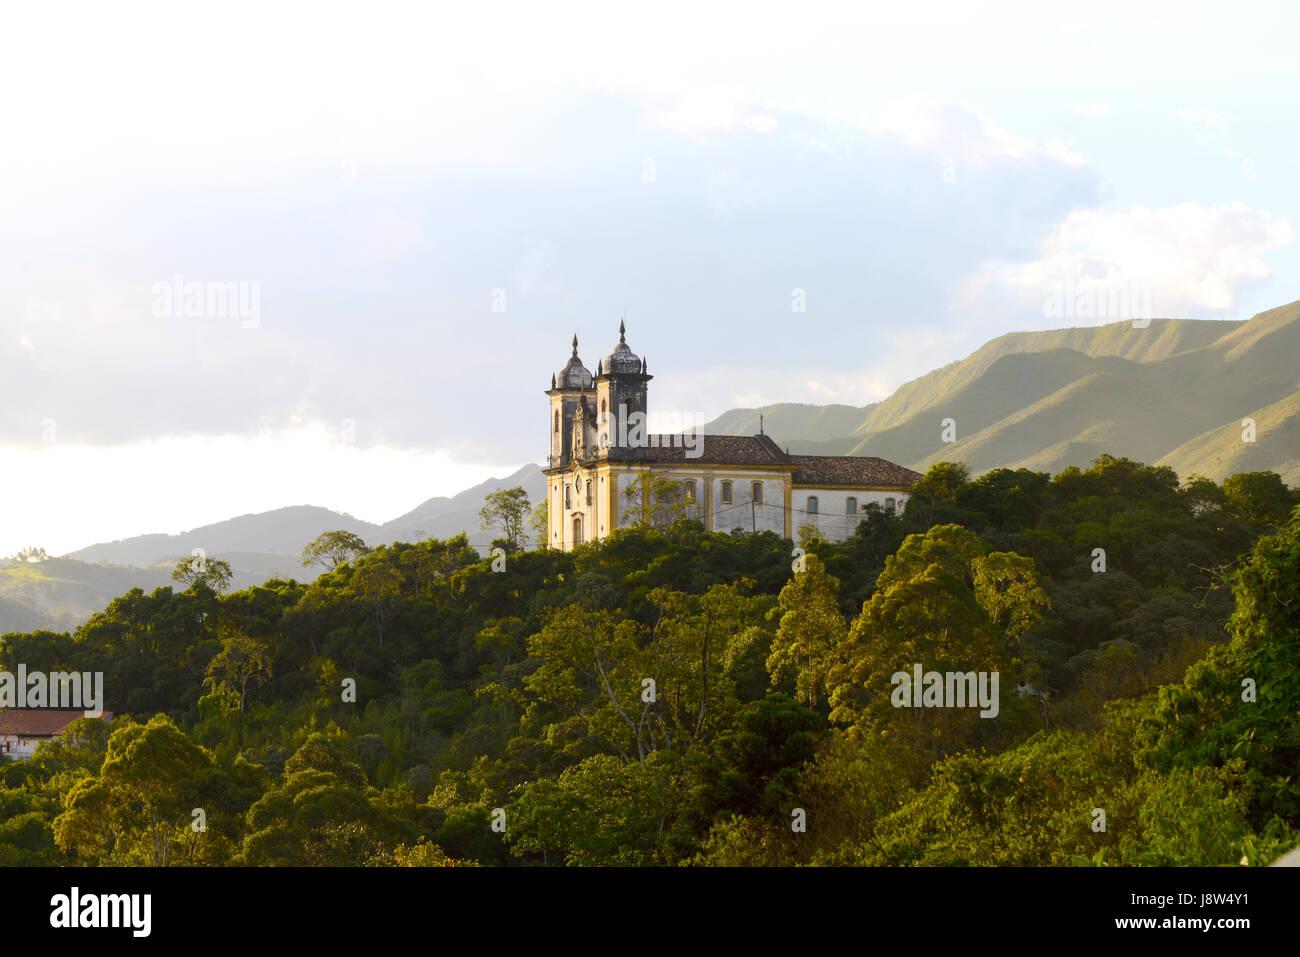 View of the unesco world heritage city of Ouro Preto in Minas Gerais, Brazil - Stock Image